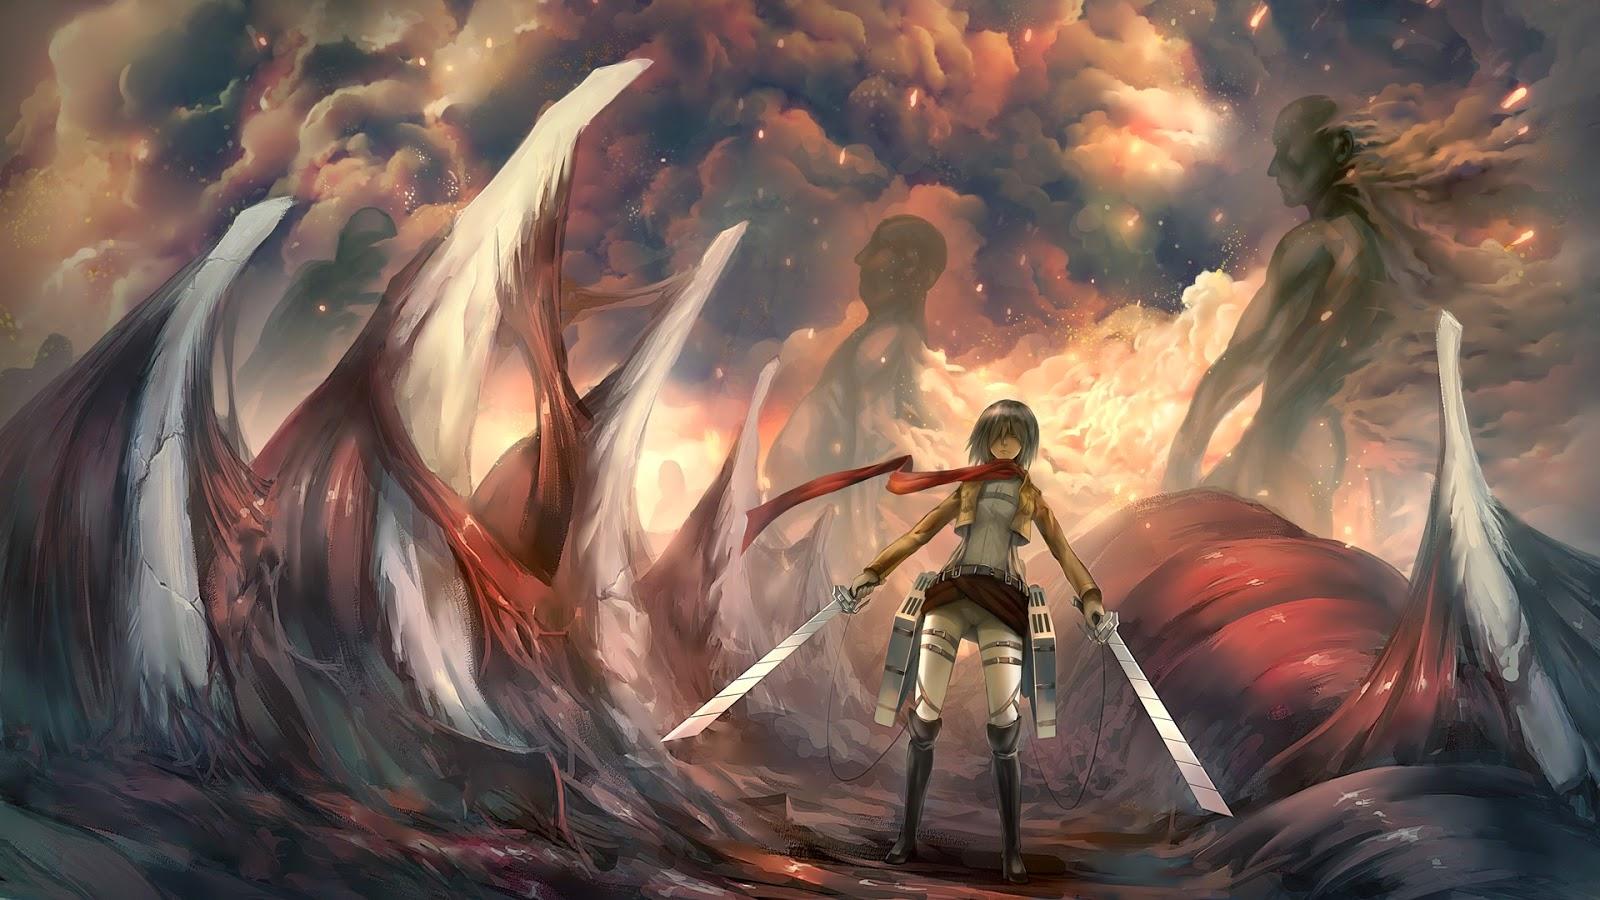 Attack On Titan Second Season Could Come In 2015